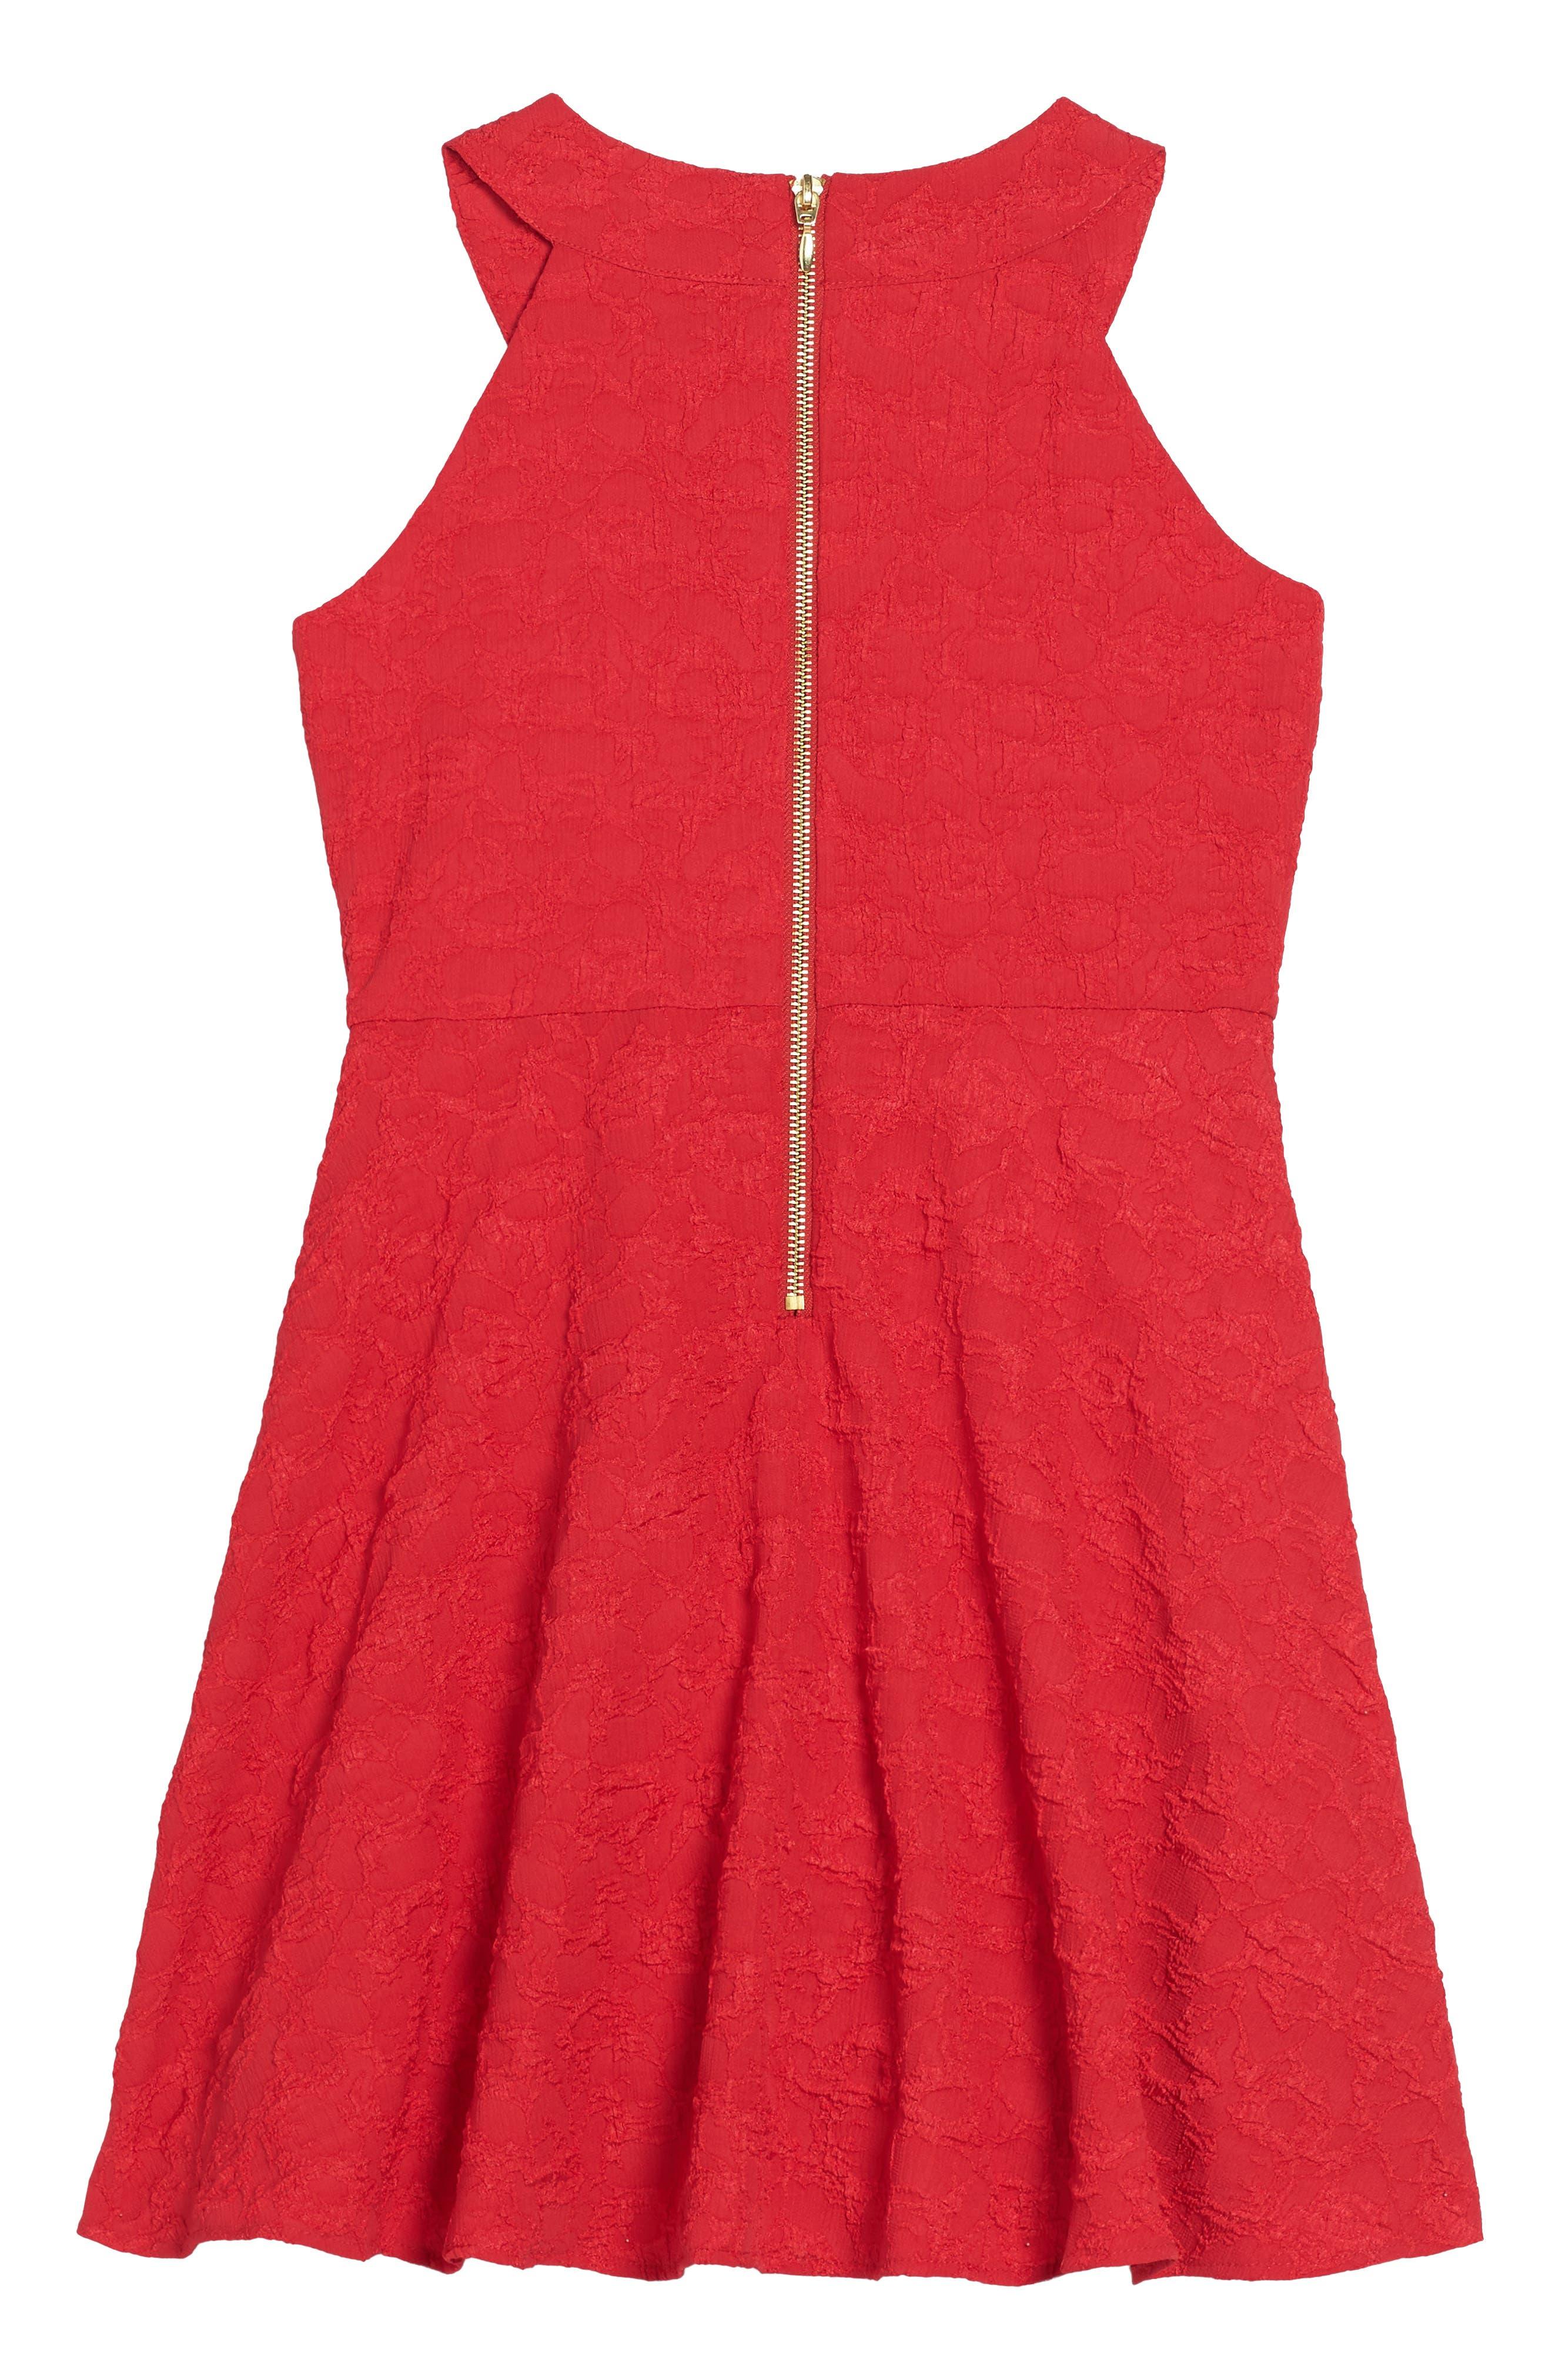 Alternate Image 2  - BLUSH by Us Angels Jewel Neck Fit & Flare Dress (Big Girls)